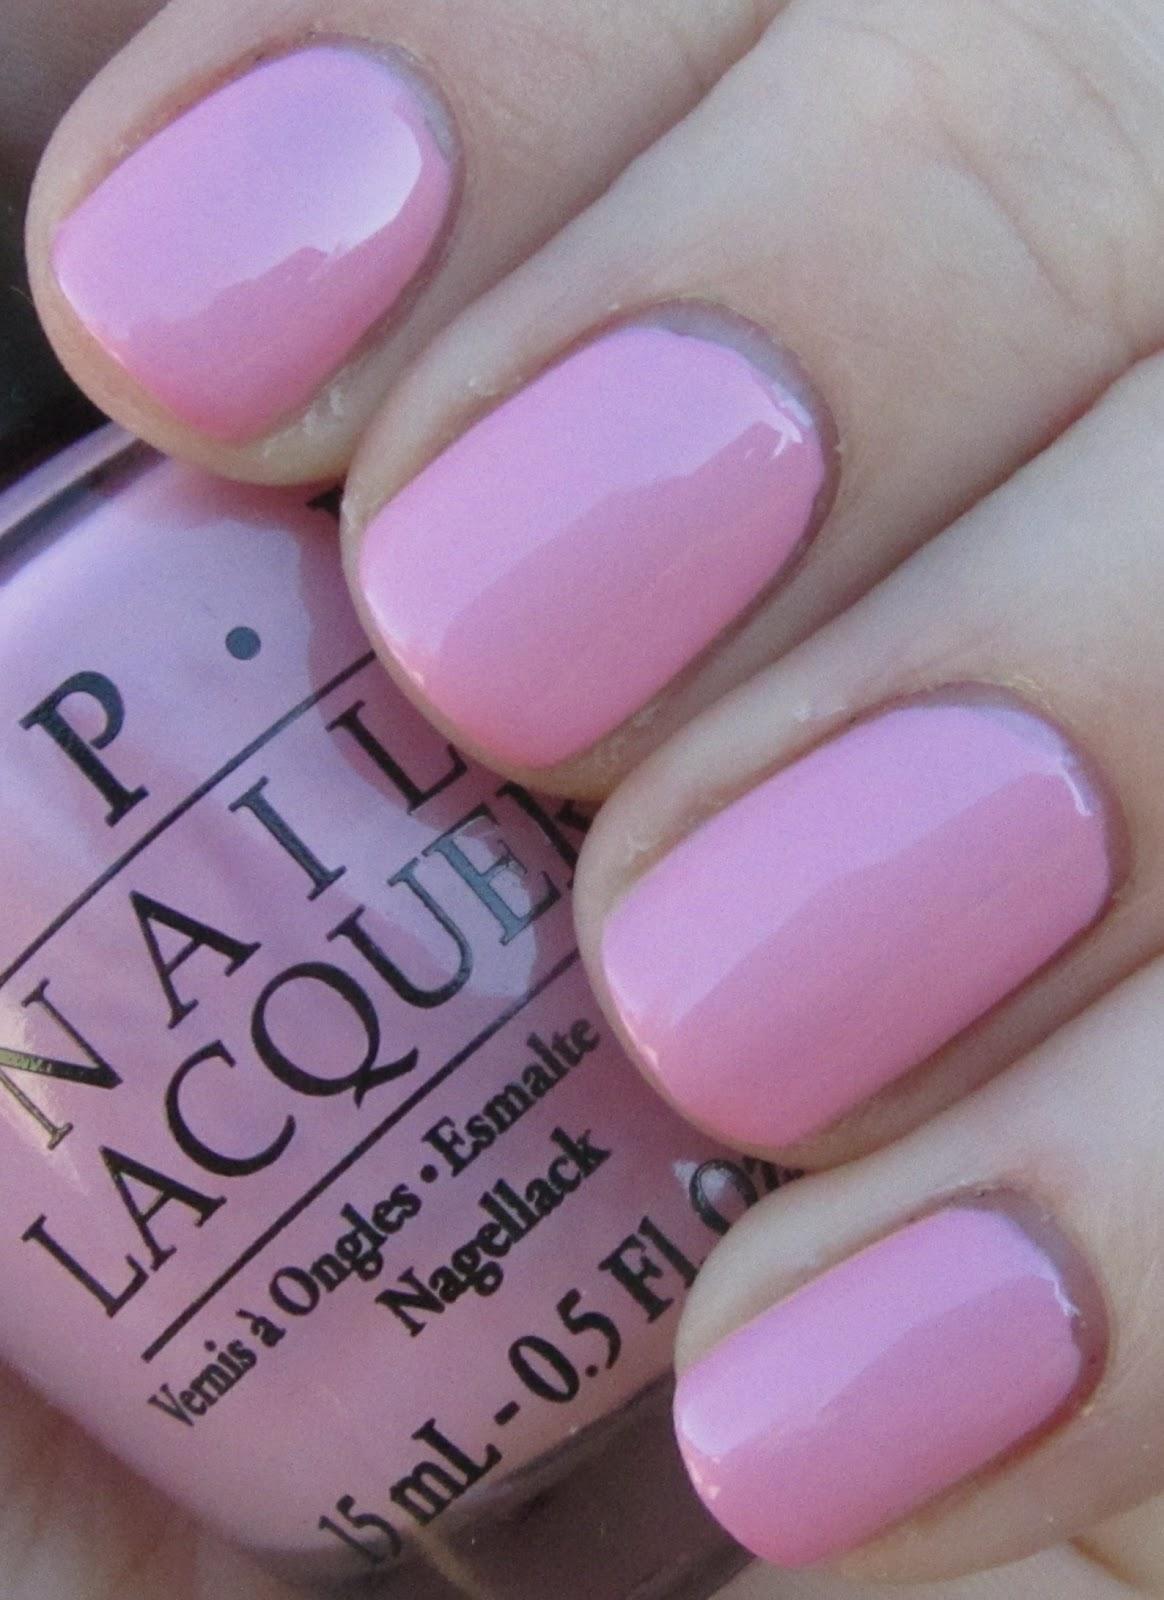 http://4.bp.blogspot.com/-l3qanaVY5zs/Tza5TonhhwI/AAAAAAAABN4/YX-YTIHegAI/s1600/Pink+Friday.jpg